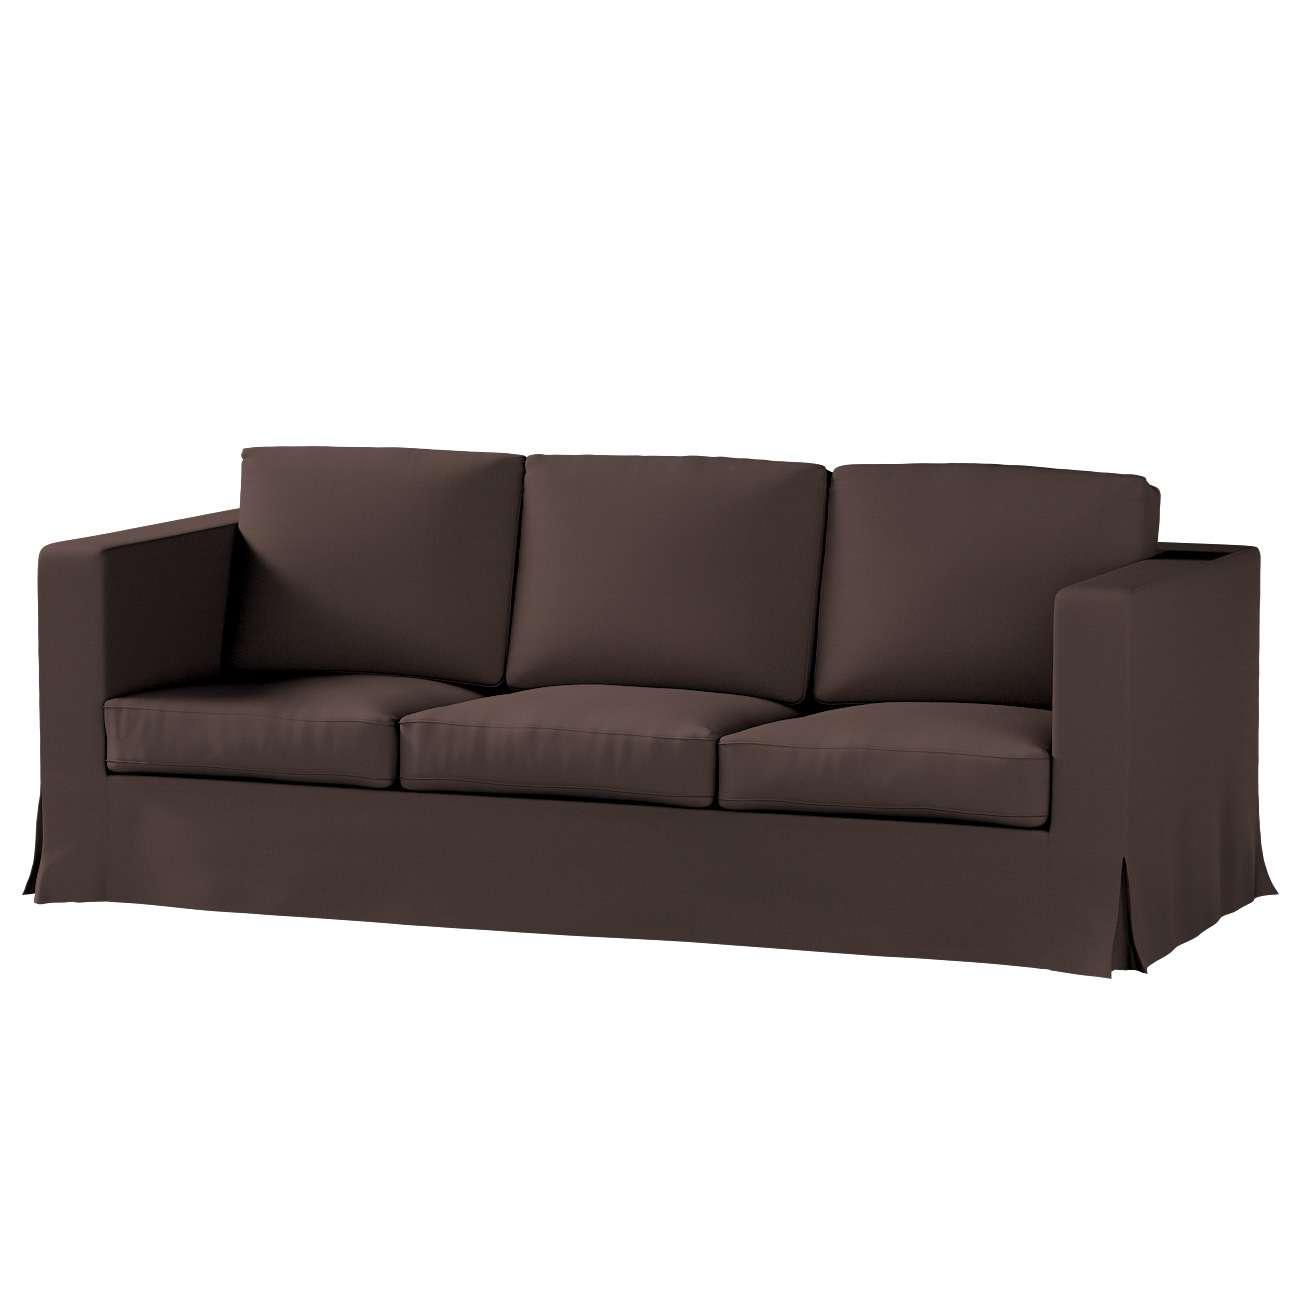 Karlanda klädsel 3-sits soffa - lång i kollektionen Panama Cotton, Tyg: 702-03